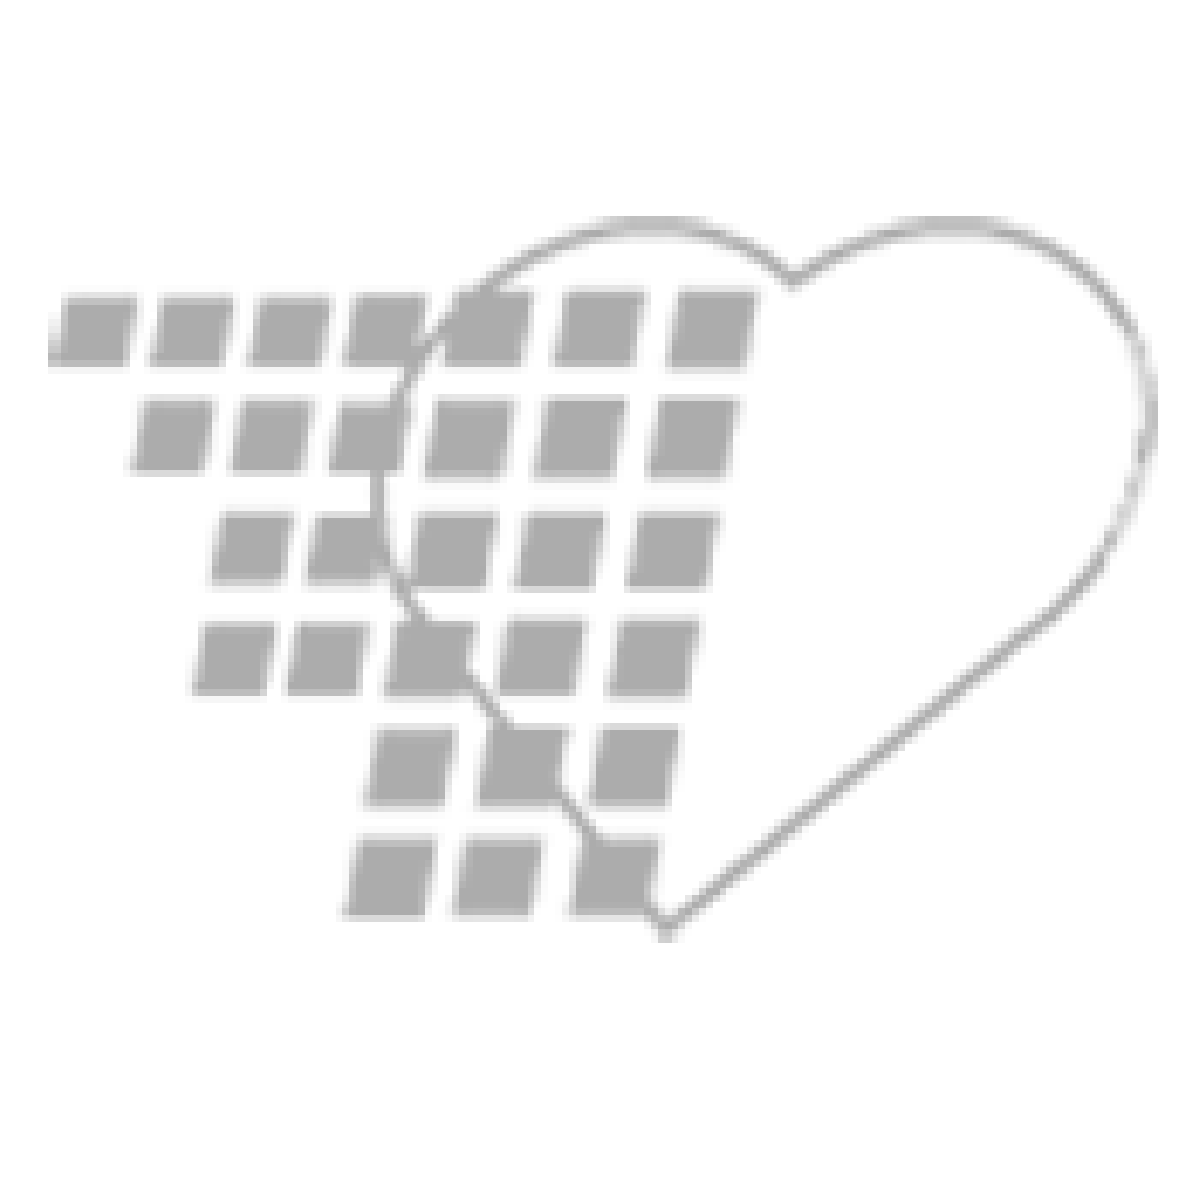 06-93-1428 Demo Dose® Gentamicn 80mg/ vial 2mL